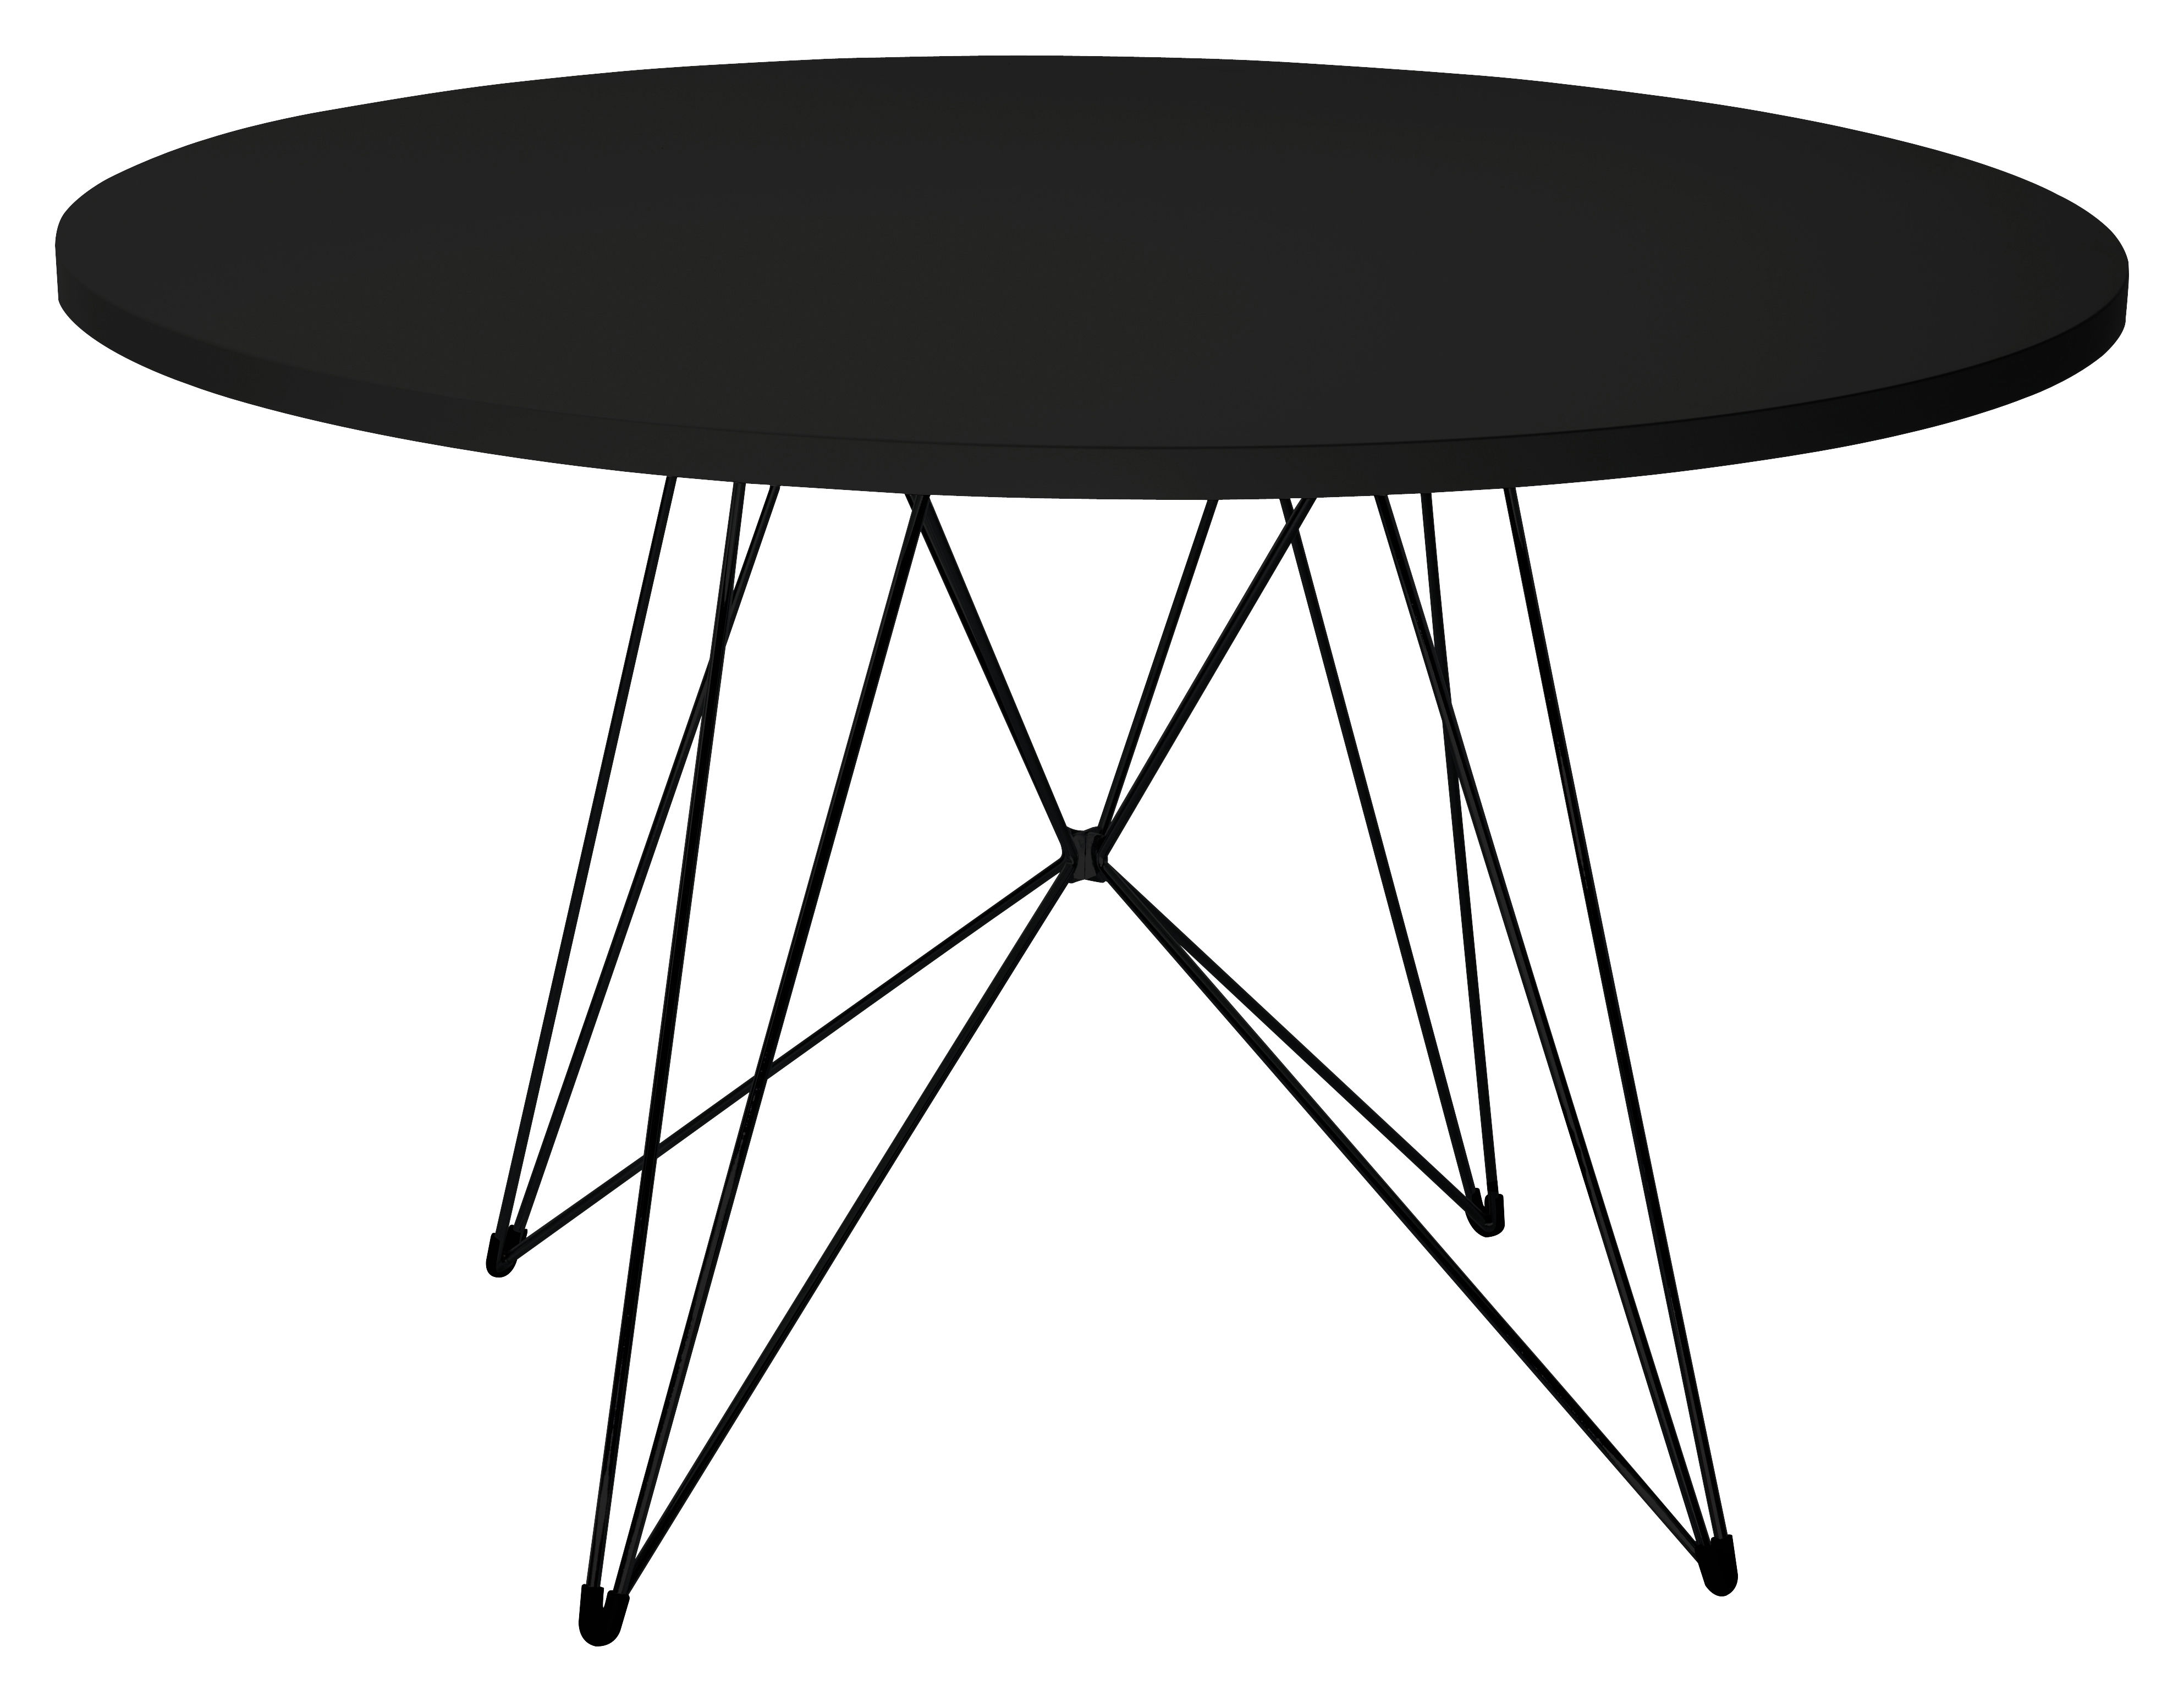 Vitrine UK - Vitrine Mobilier UK - Table XZ3 / Ronde - Ø 120 cm - Magis - Noir / Pied noir - Acier, MDF finition polymère